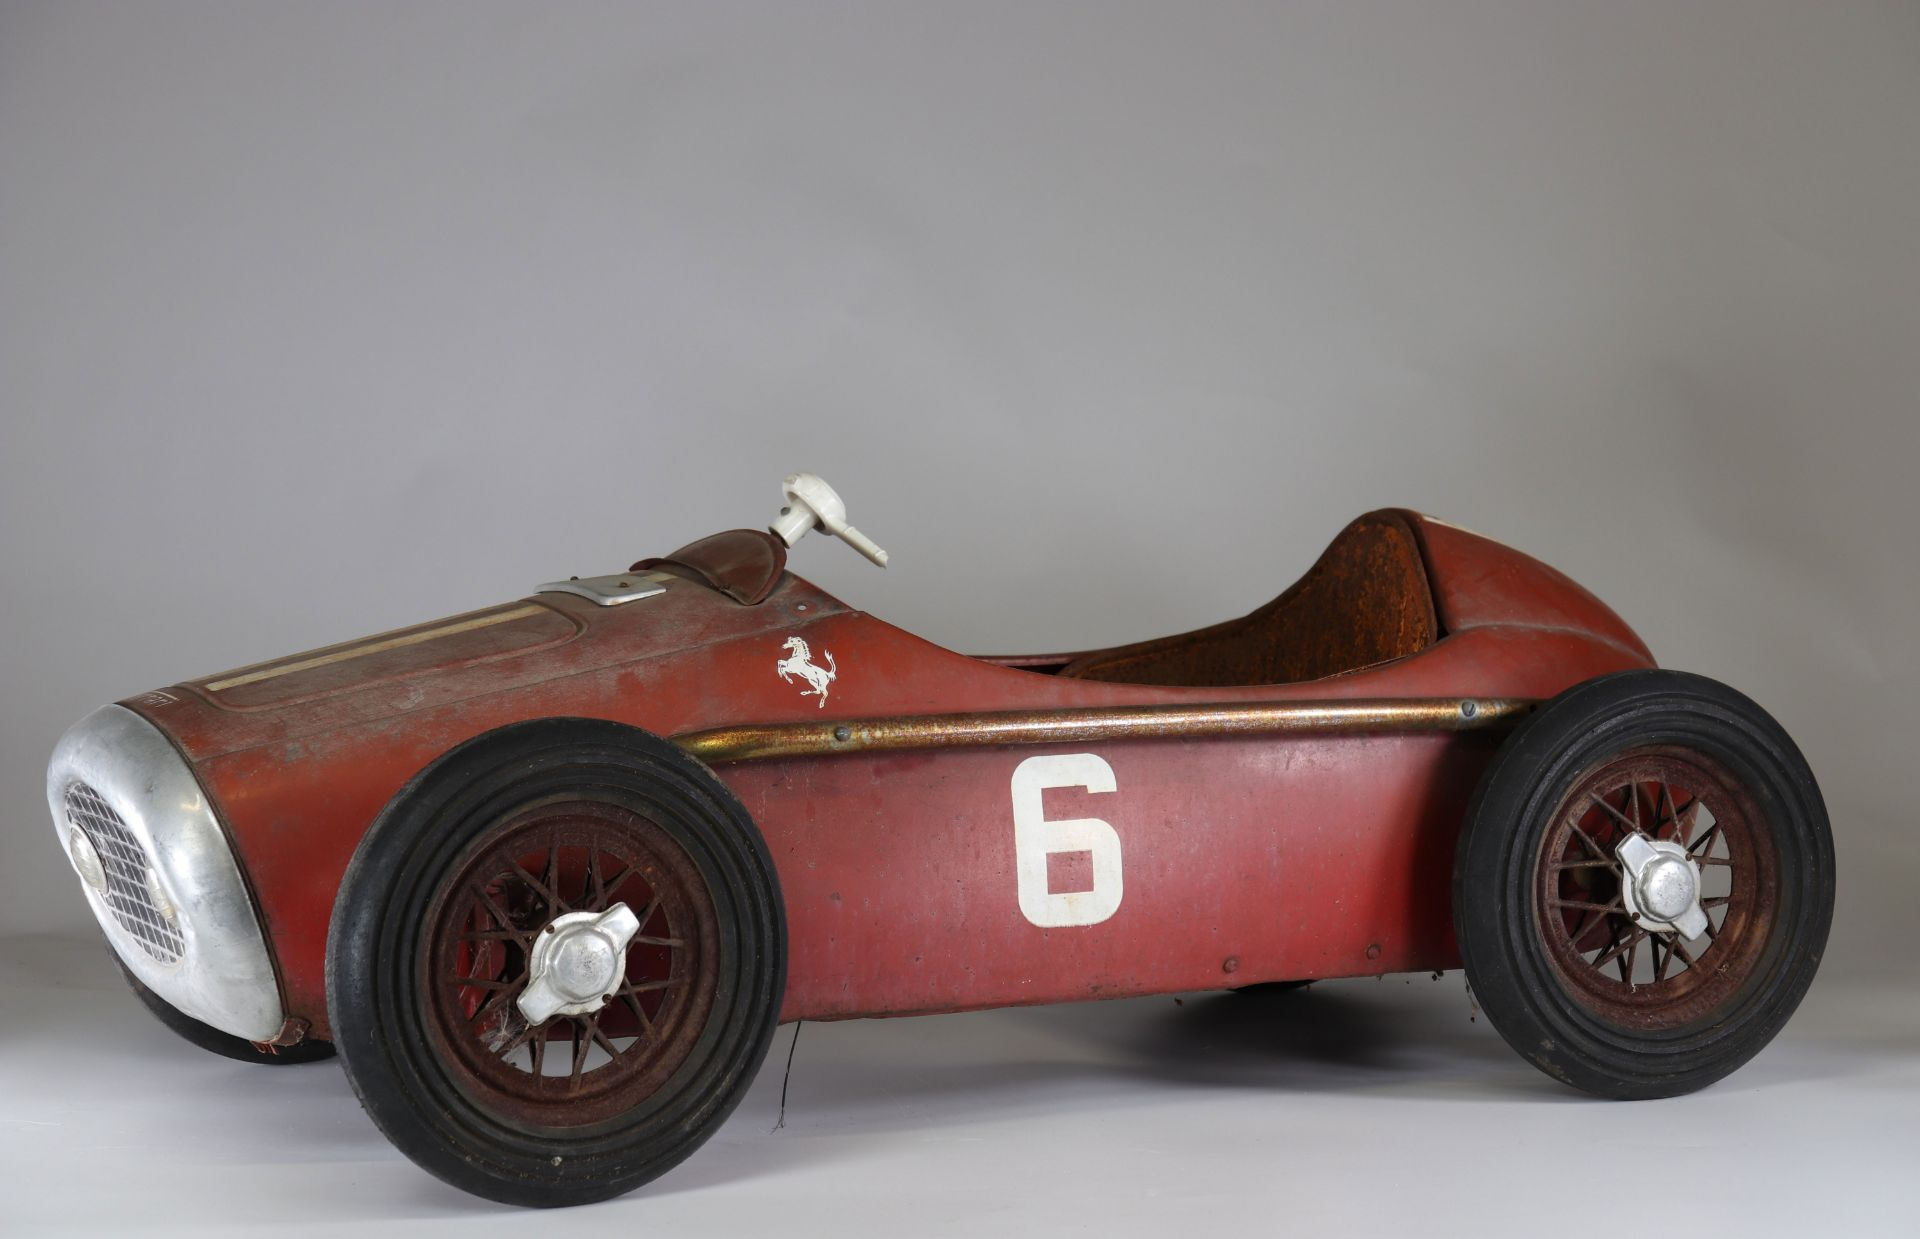 Old Ferrari pedal car - Image 2 of 2